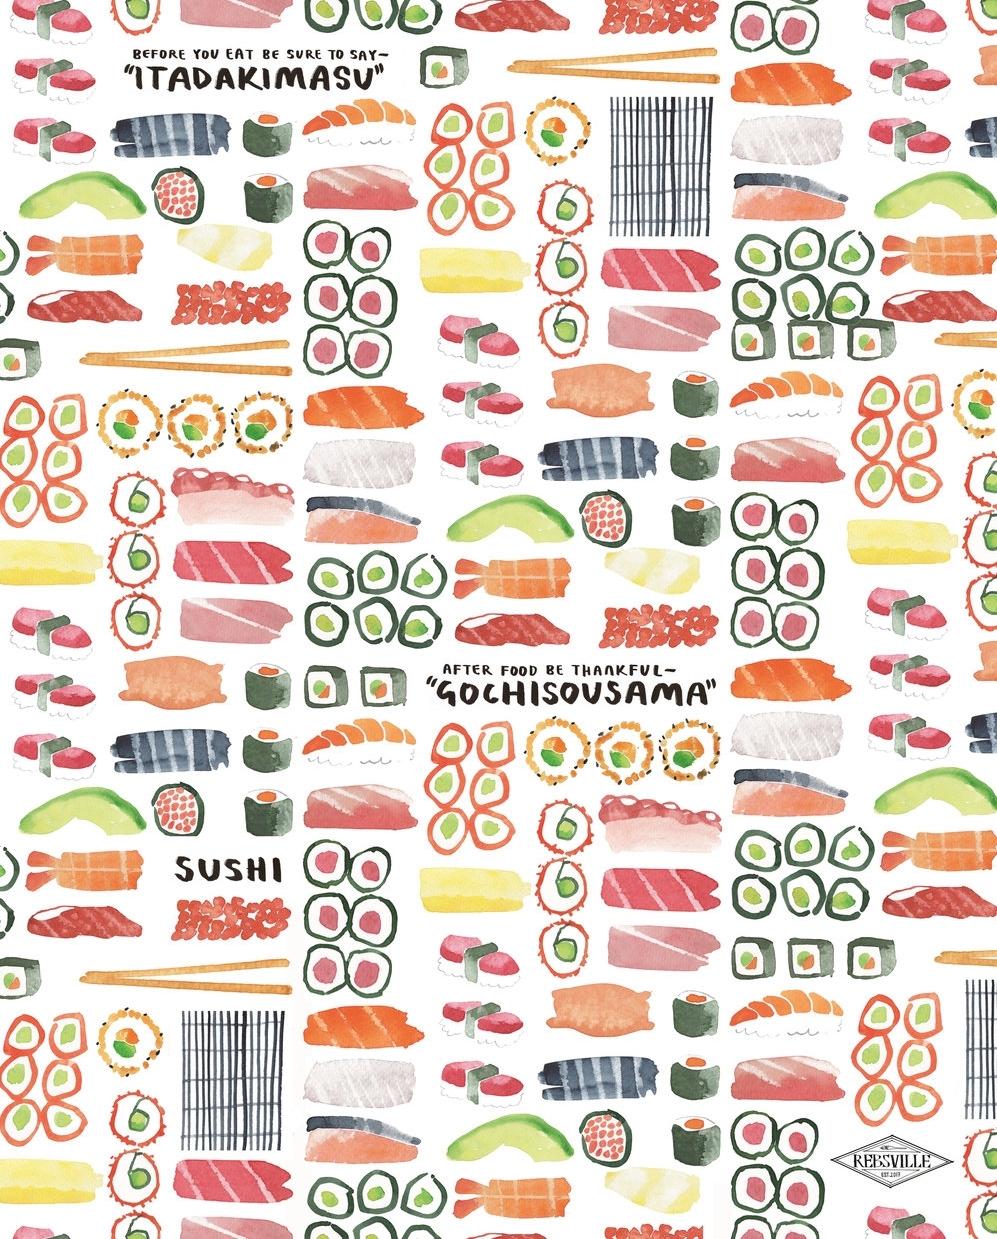 'Eat Sushi' Tea Towel  - £12.50  Rebsville Art Studio